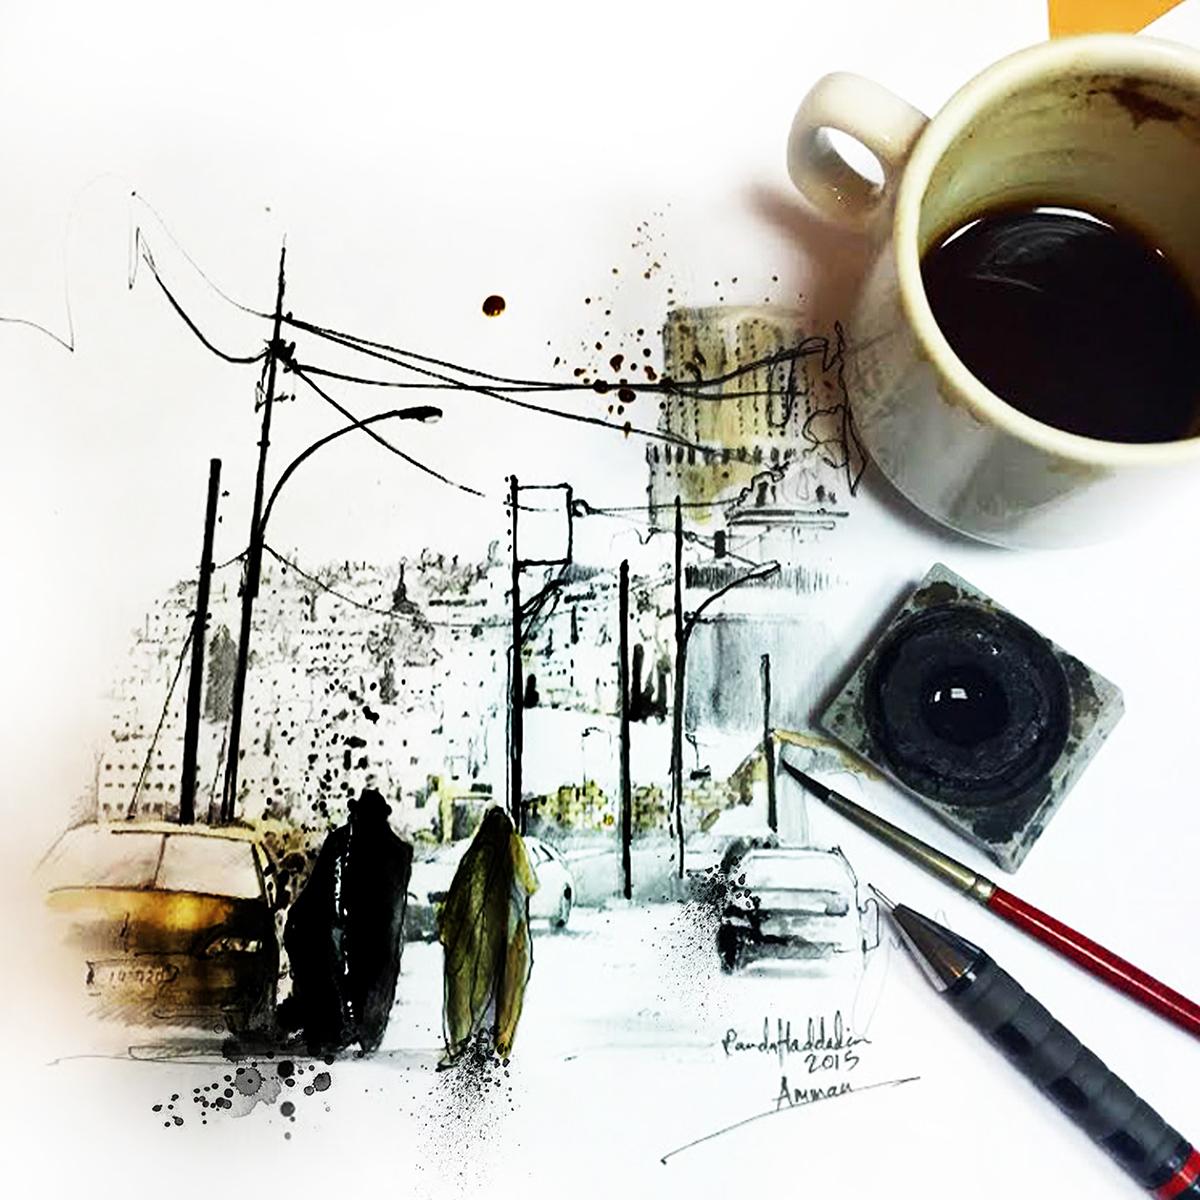 coffeeart illustration architecture Urbanart cityscape art sketch urbanism   amman jordan newyork streetstyle